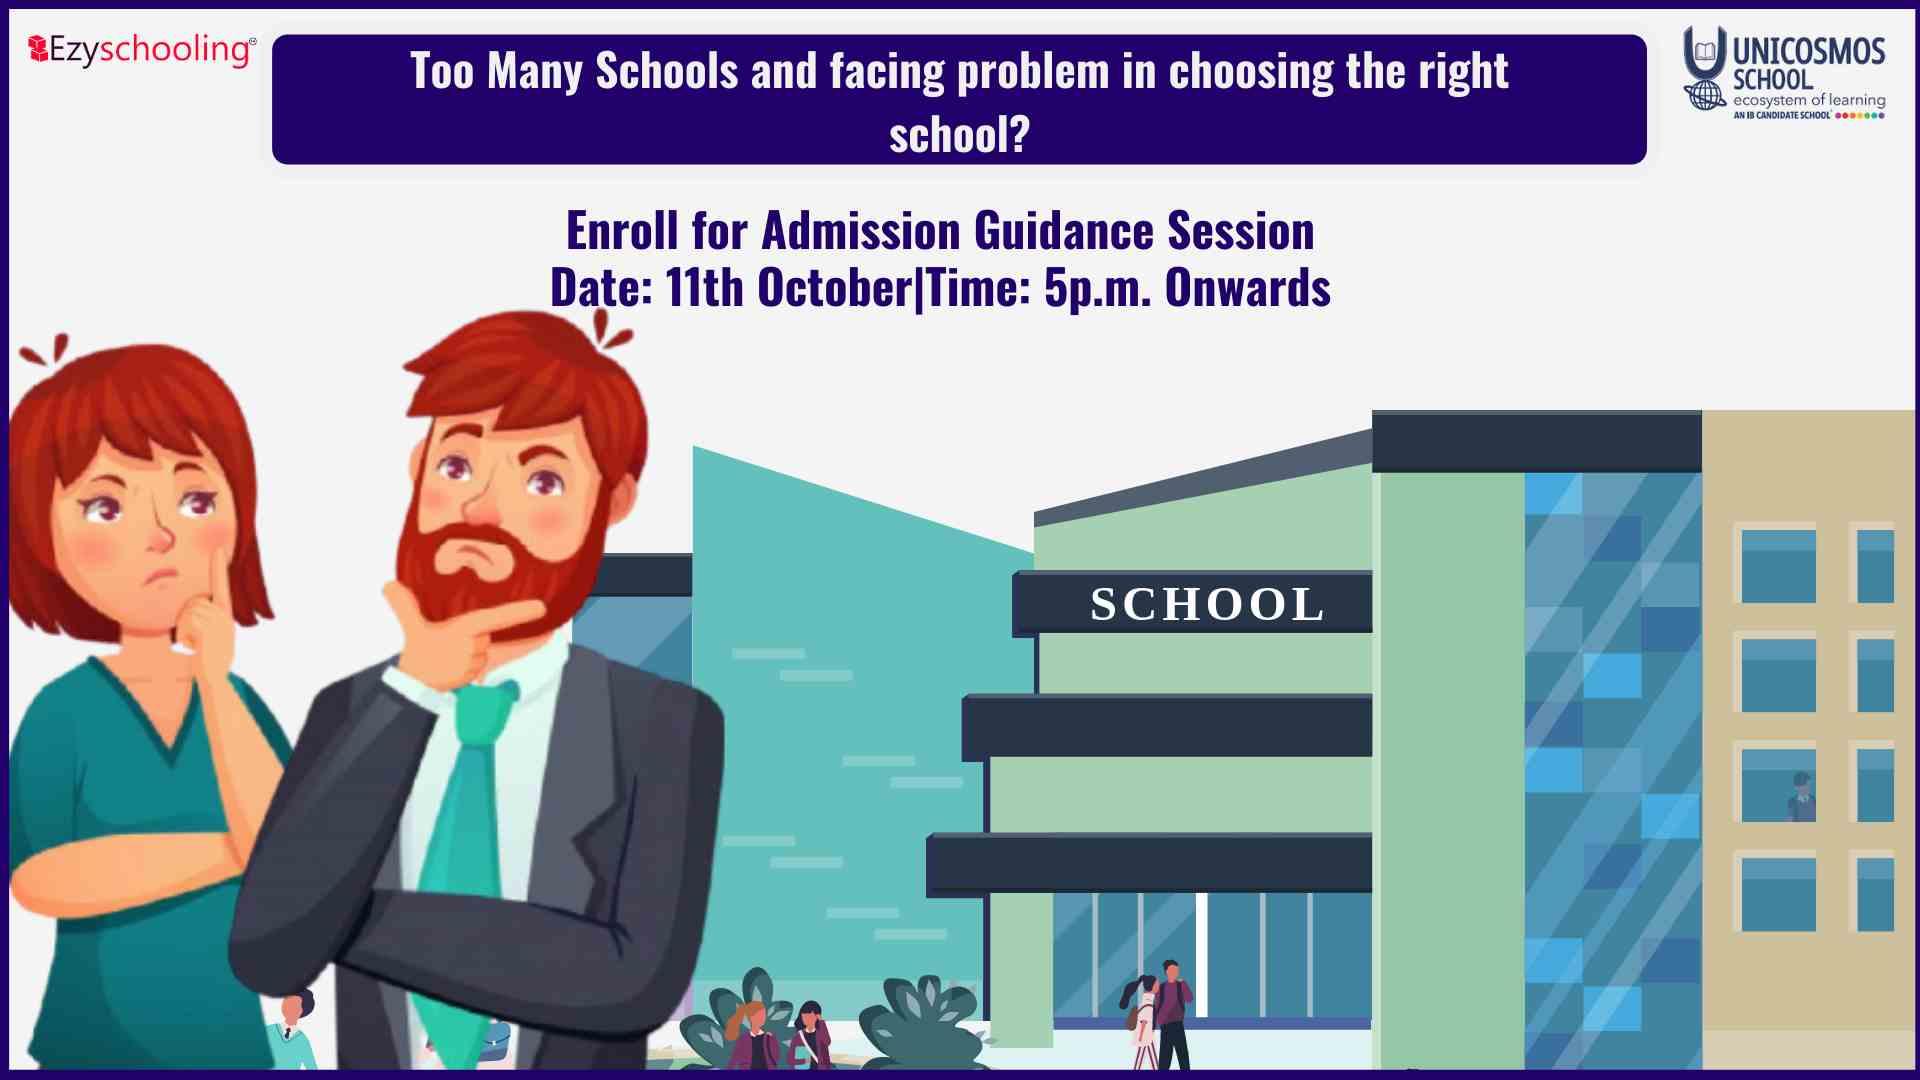 Workshop on school selection in Gurgaon